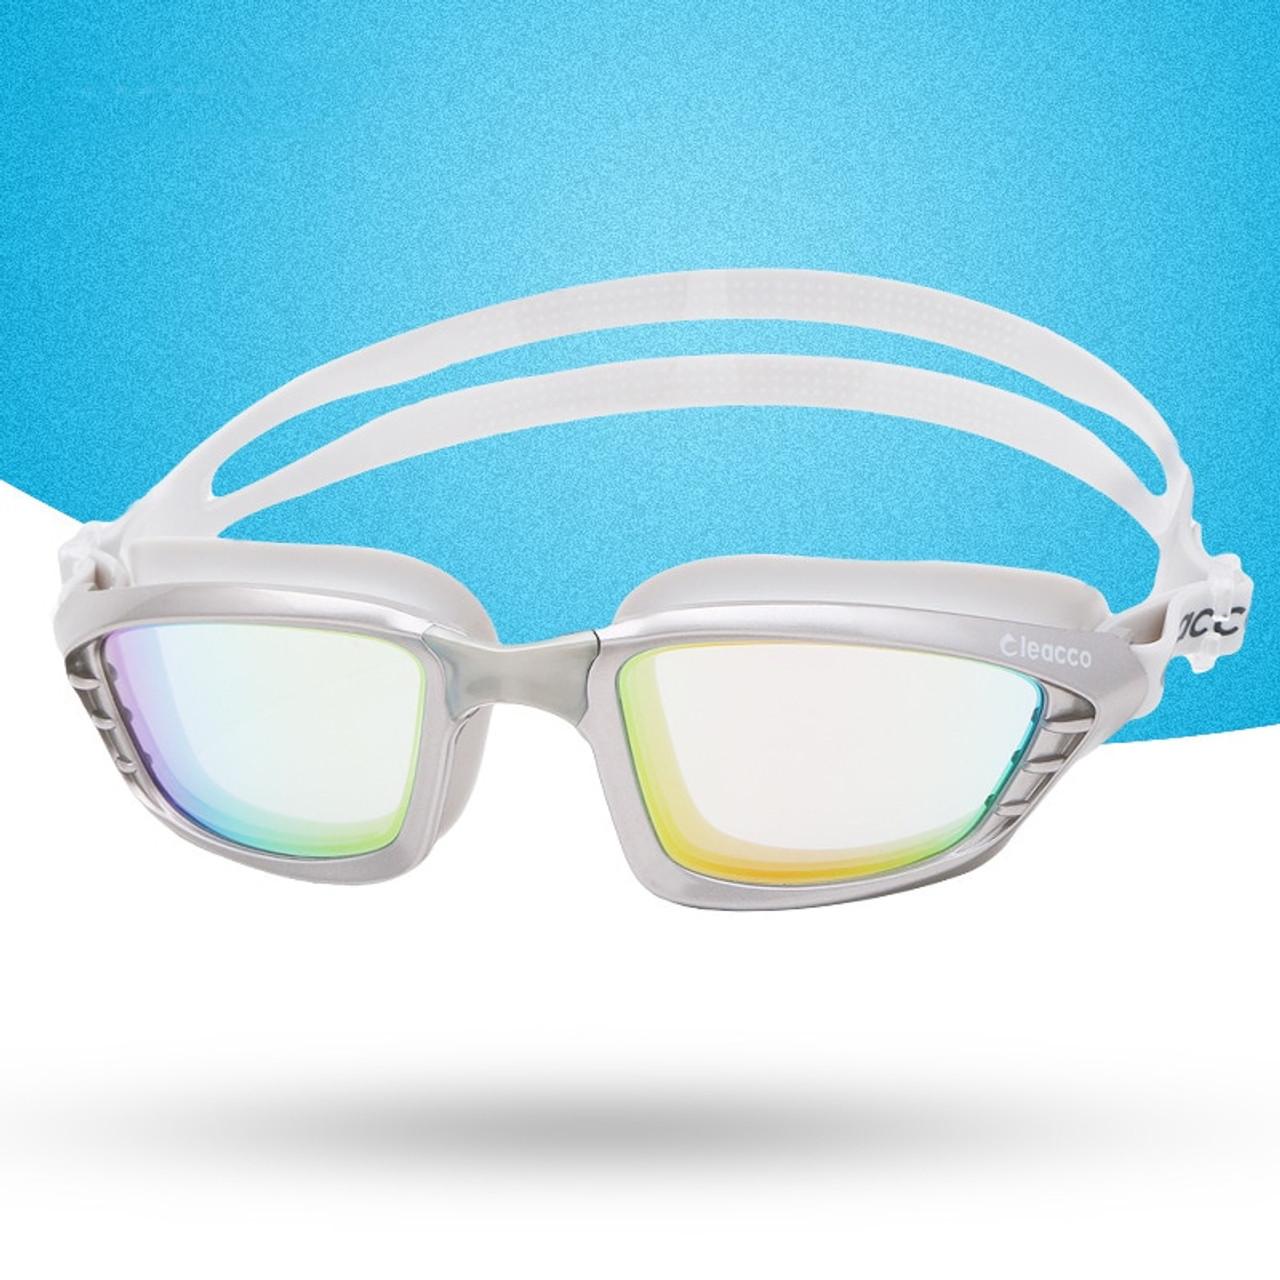 223f64160da ... Professional Anti-Fog UV Swim Goggles men women Plating Lens Waterproof  Silicone Swimming Glasses Eyewear ...